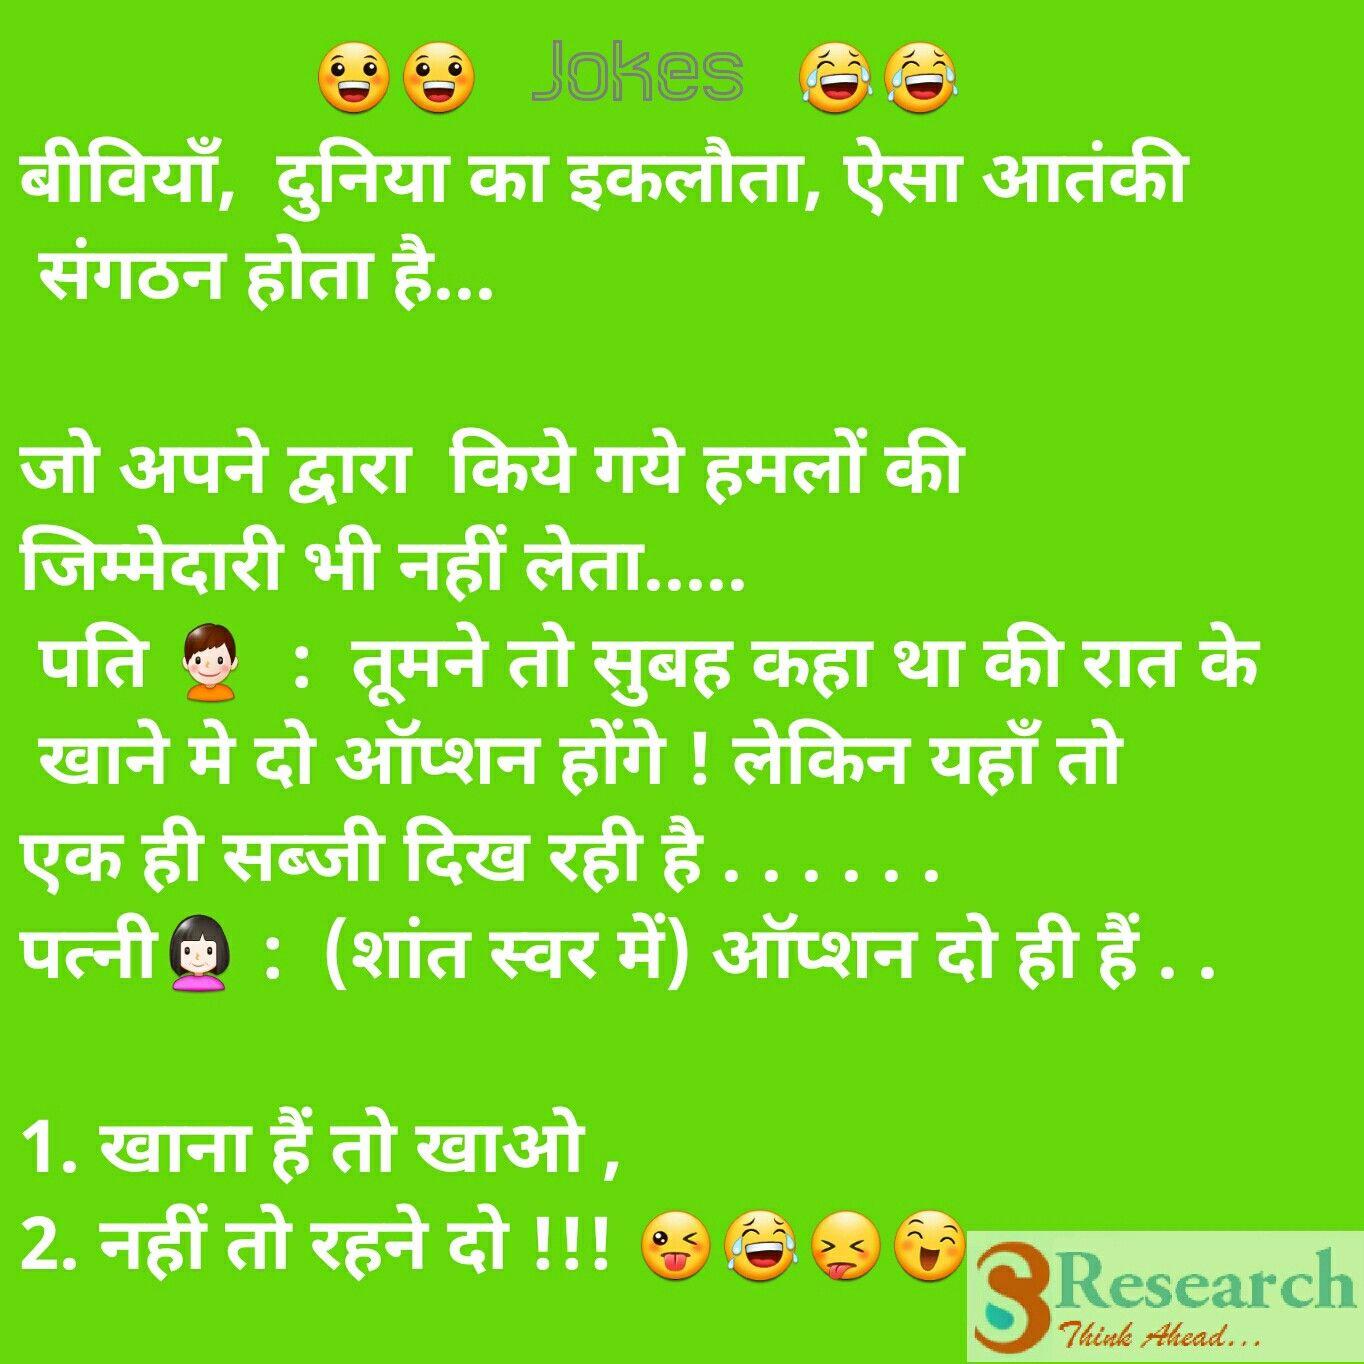 Pin by Sadhna Goel on Riddles & jokes Funny jokes in hindi